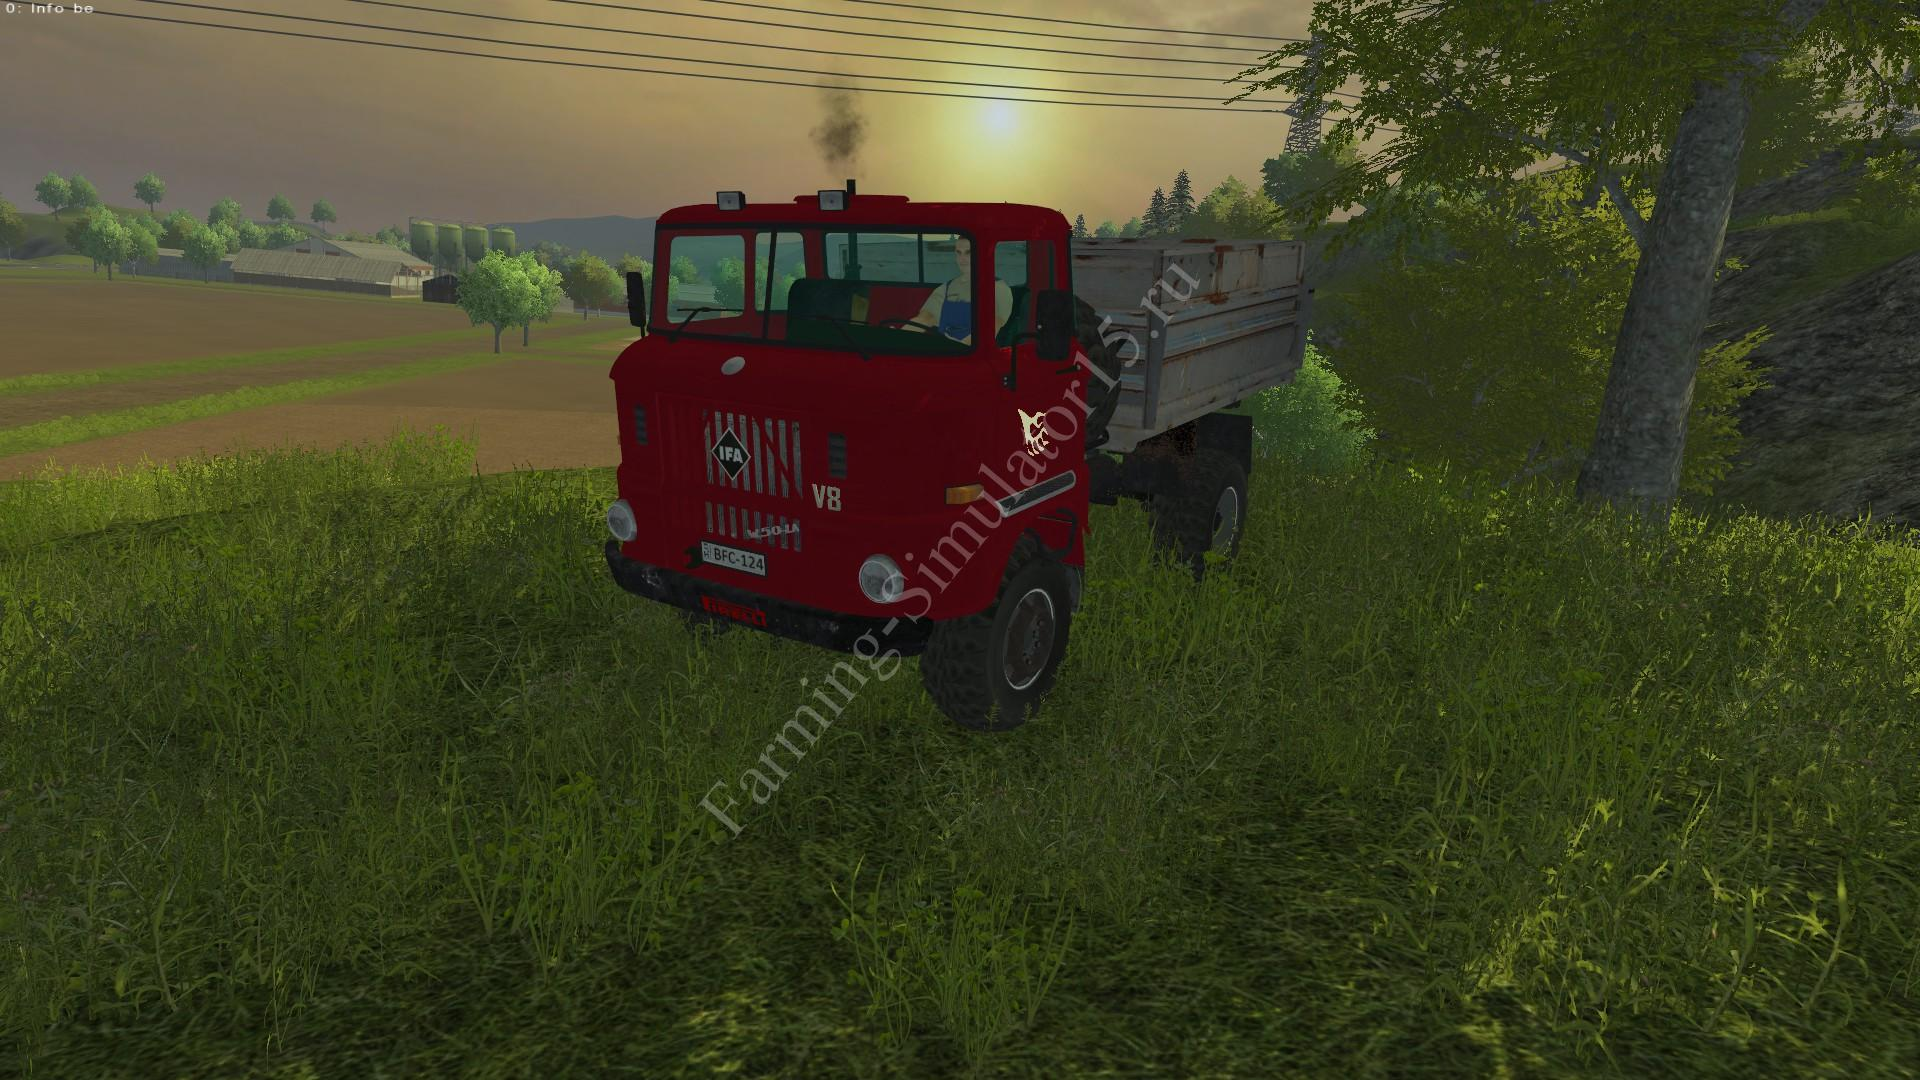 Мод грузовика IFA W50 LA V8 v 2.0 Farming Simulator 2013, Farming Simulator 13